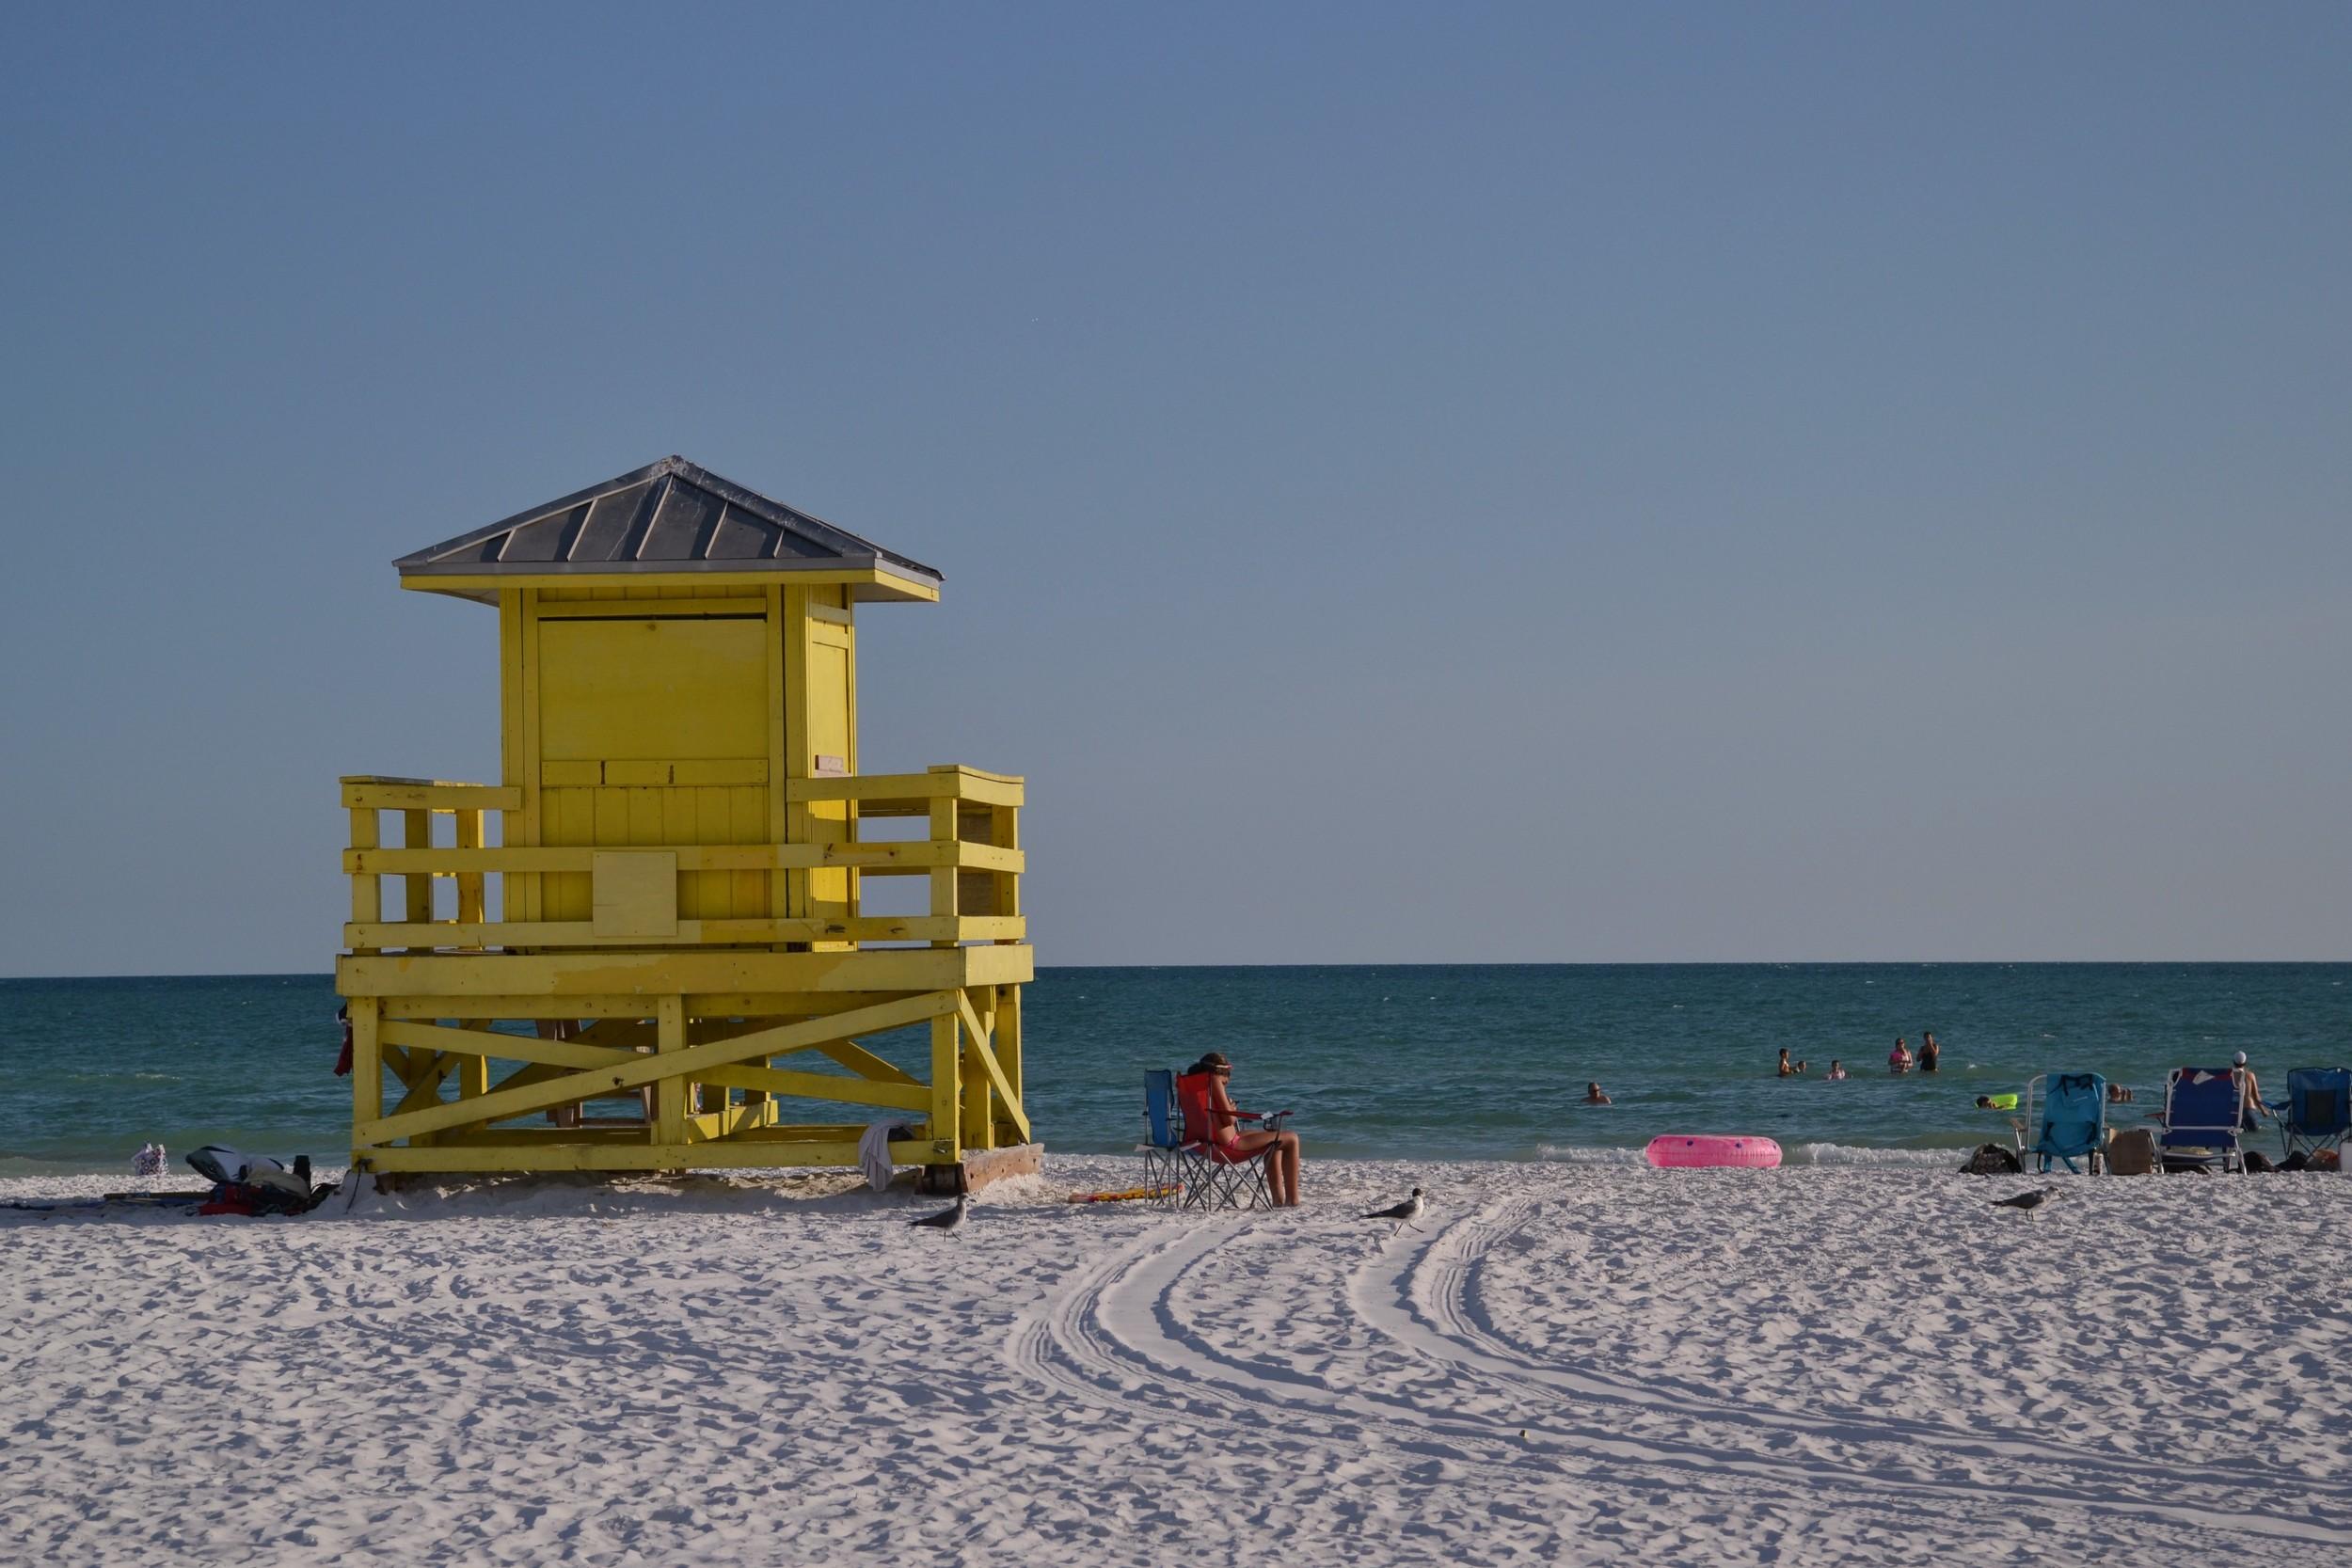 Siesta Key, Sarasota- one of the world's finest beaches,made of white sugar sand.